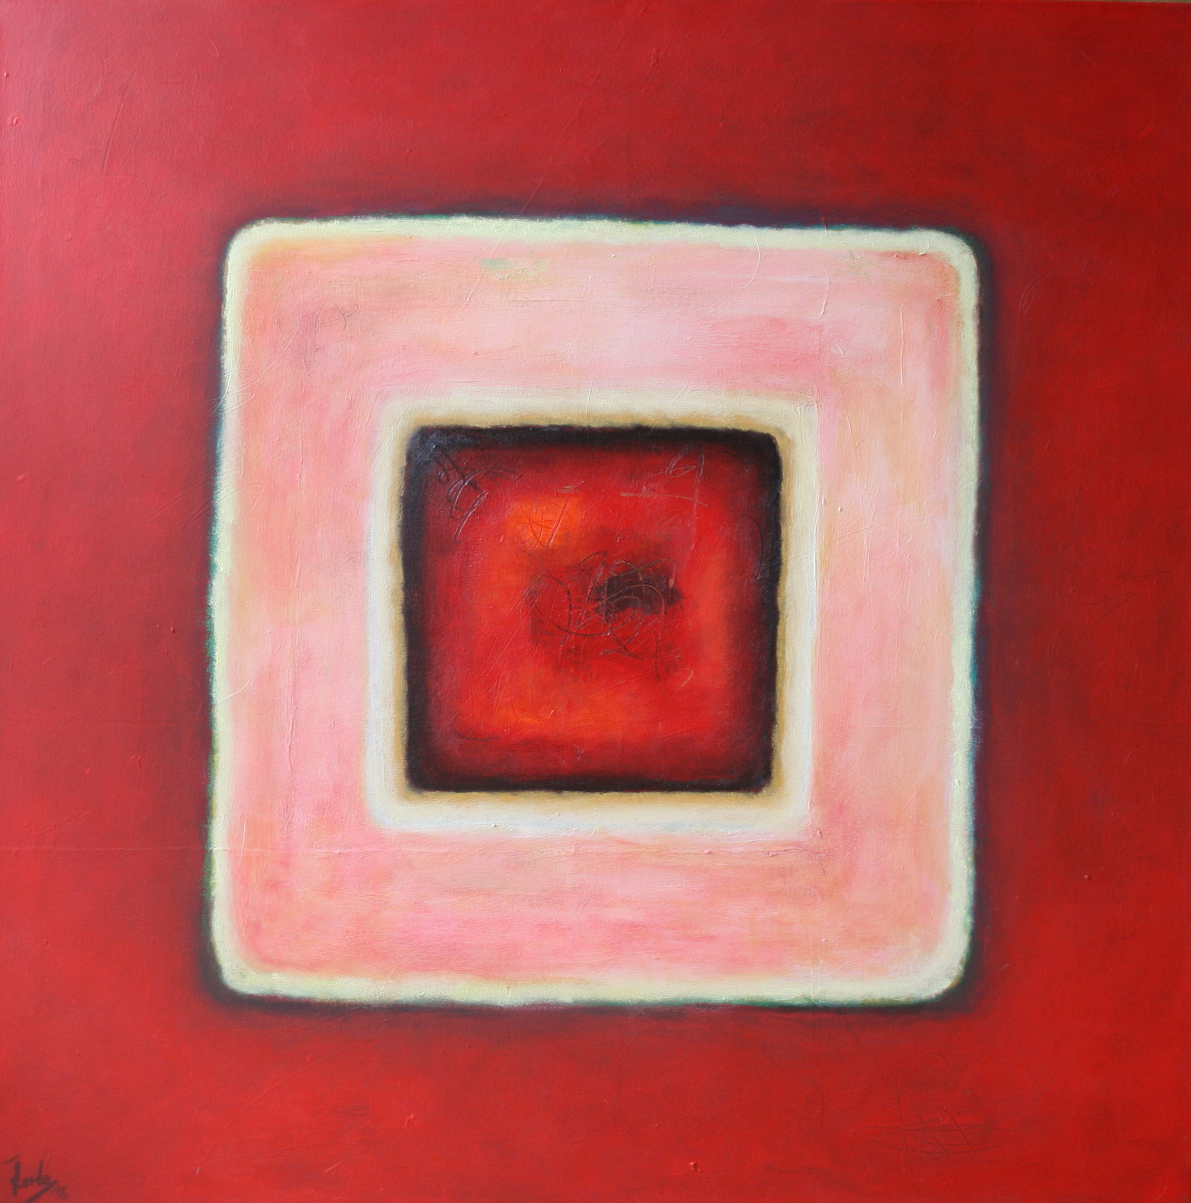 Karree in Rot, Öl und Acryl auf Leinwand, 100 x 100 cm